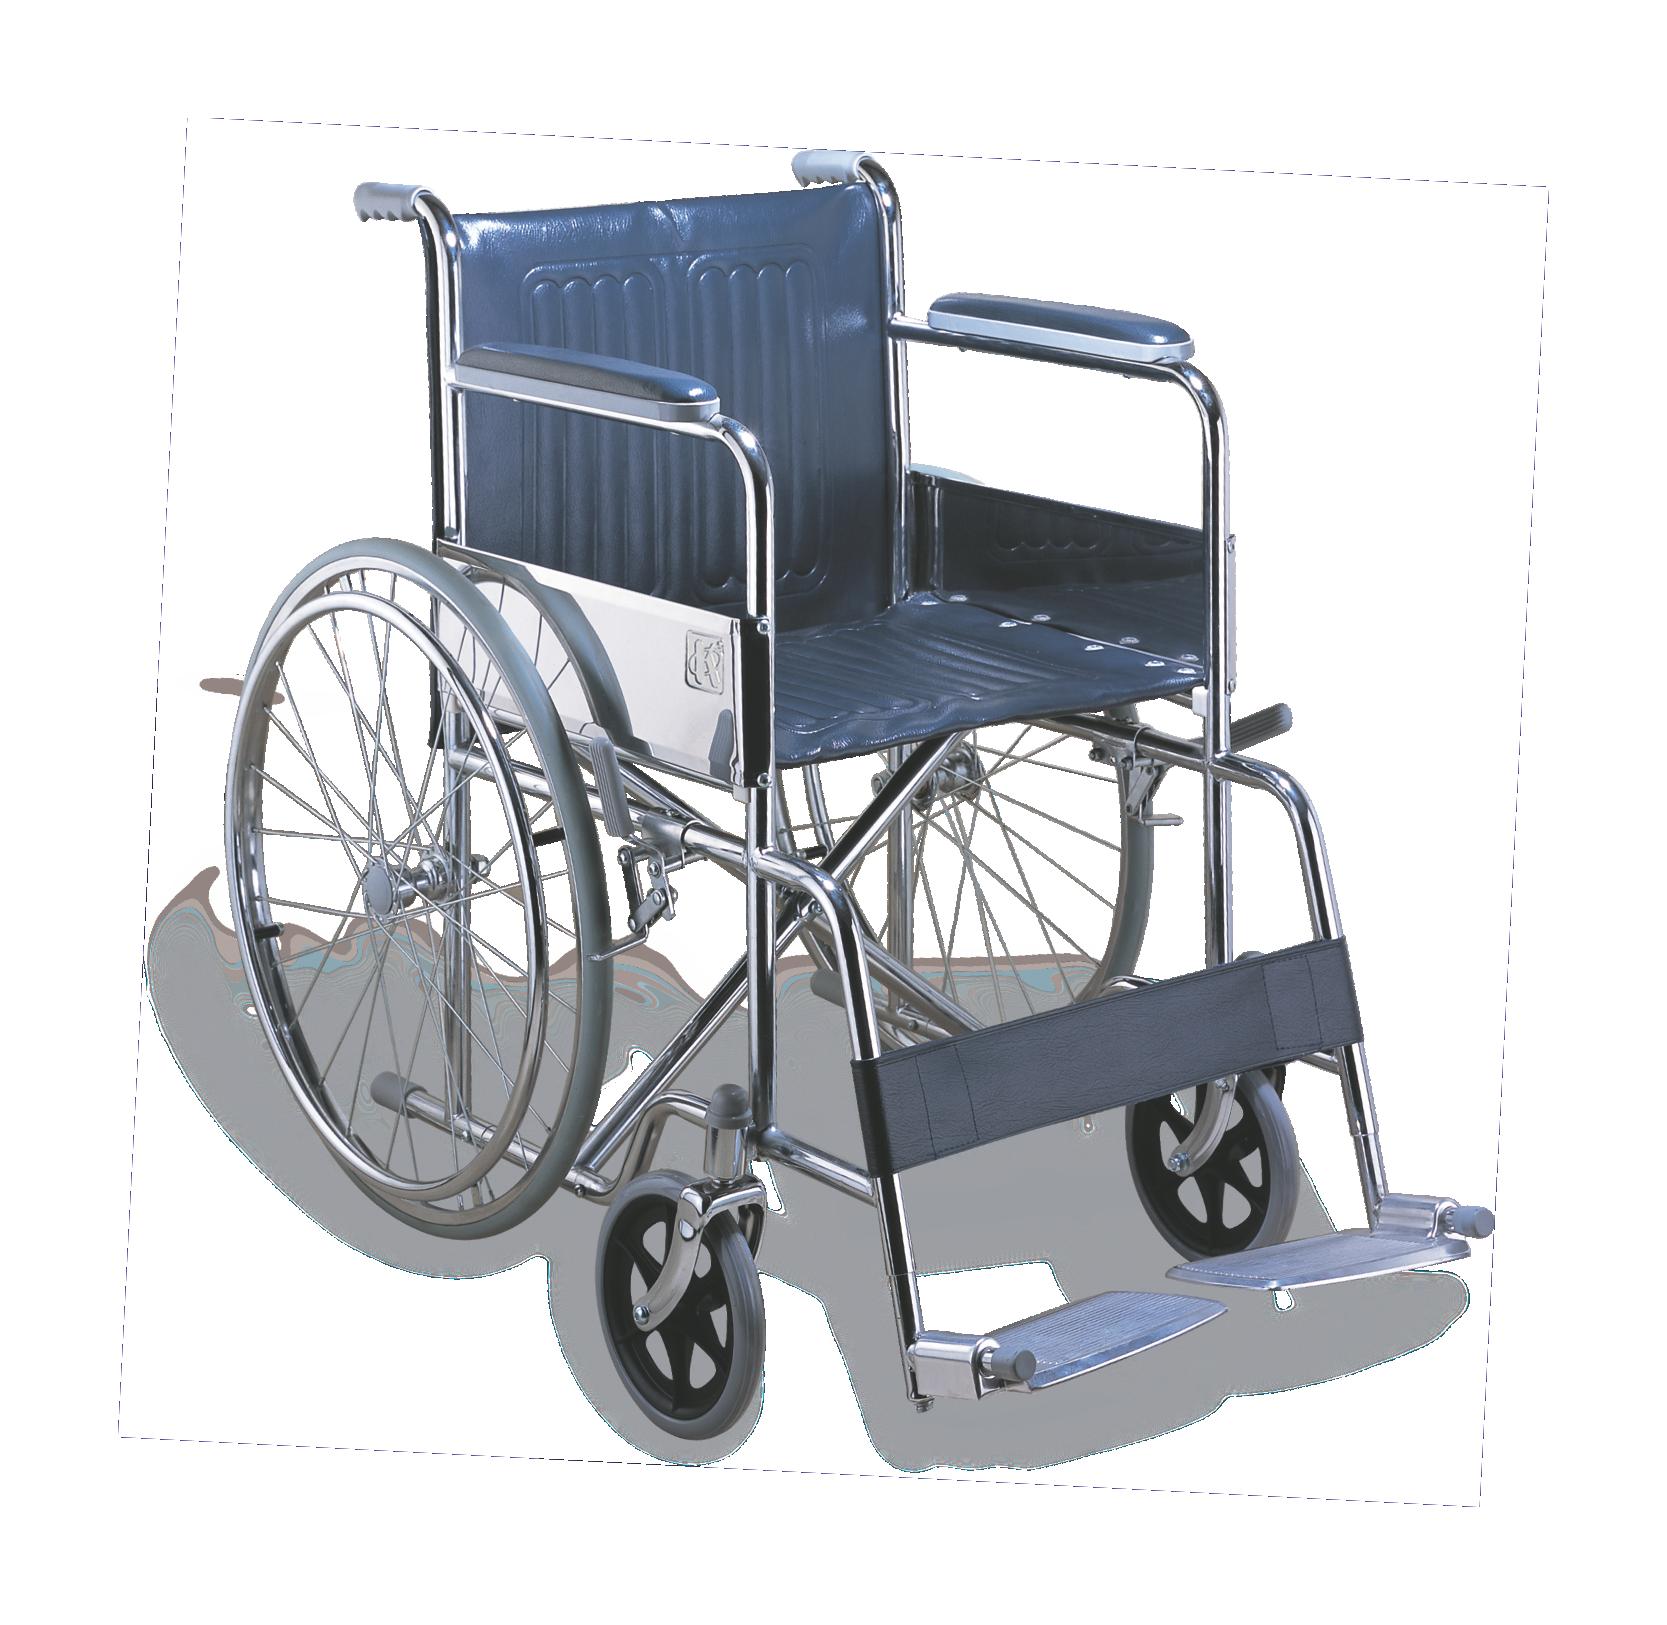 Steel Wheelchair Png Image Wheelchair Accessories Wheelchair Buy Chair